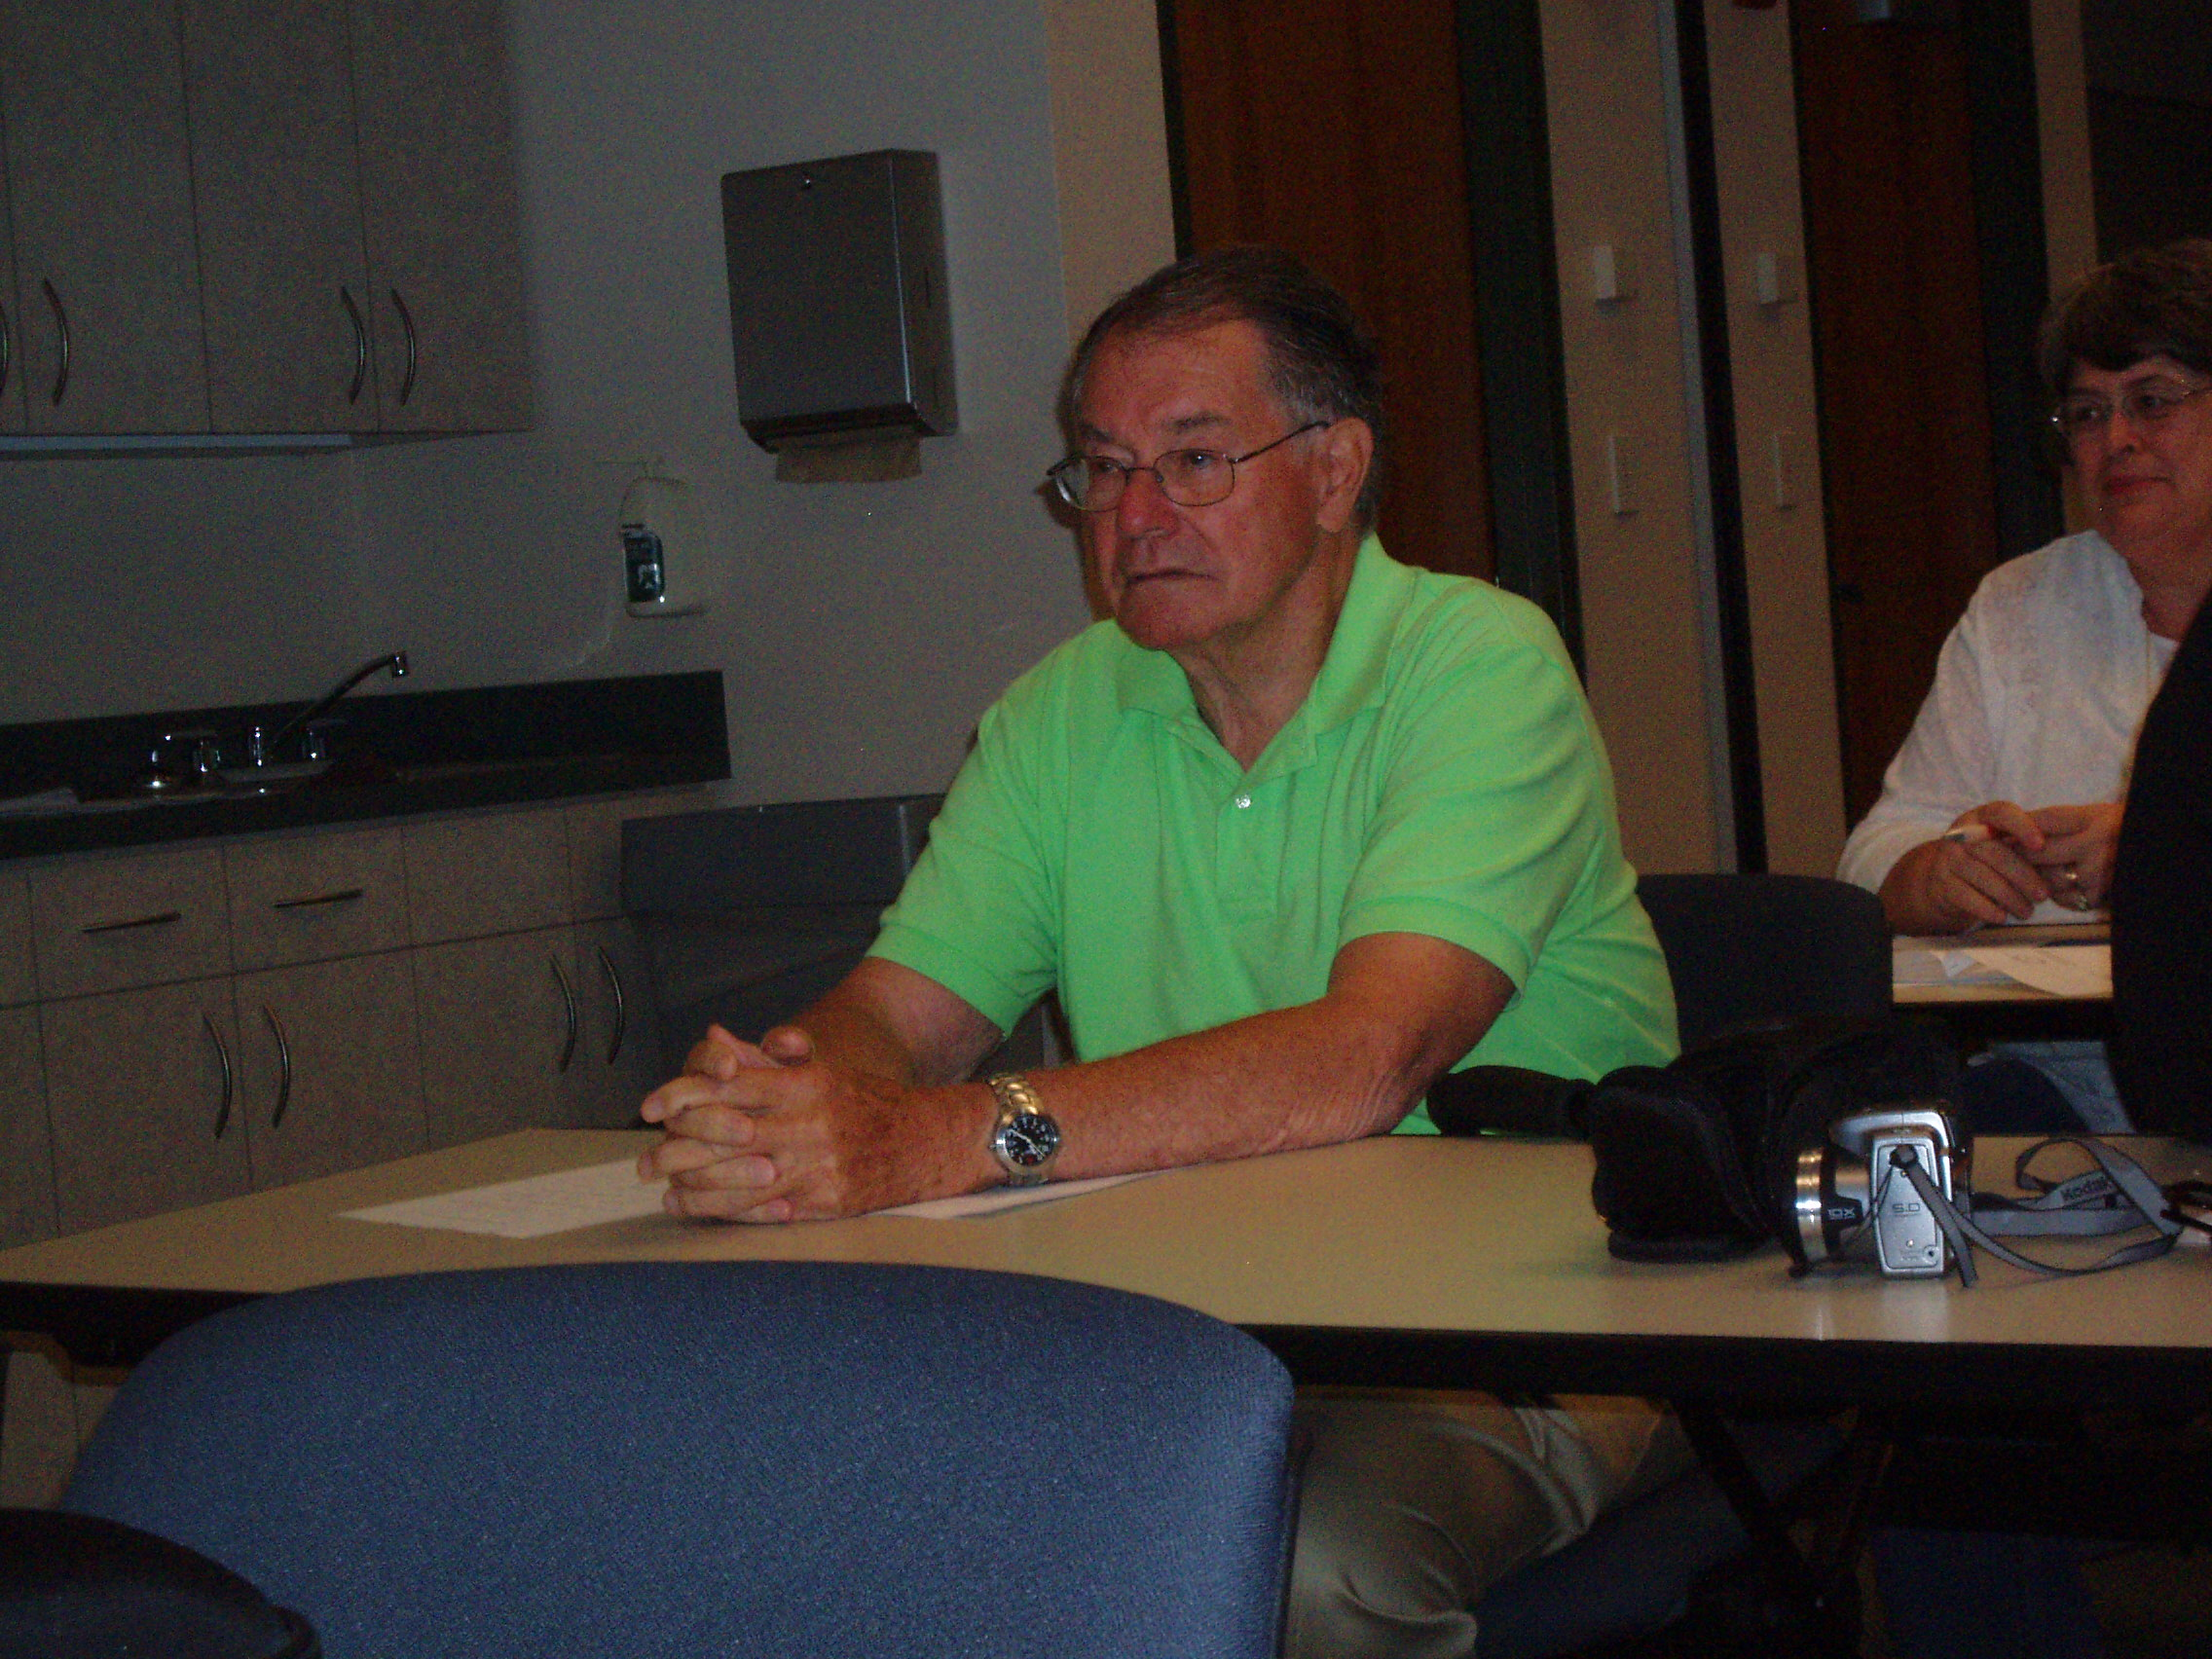 Dr. Gunnar Stickler, Omaha Conf